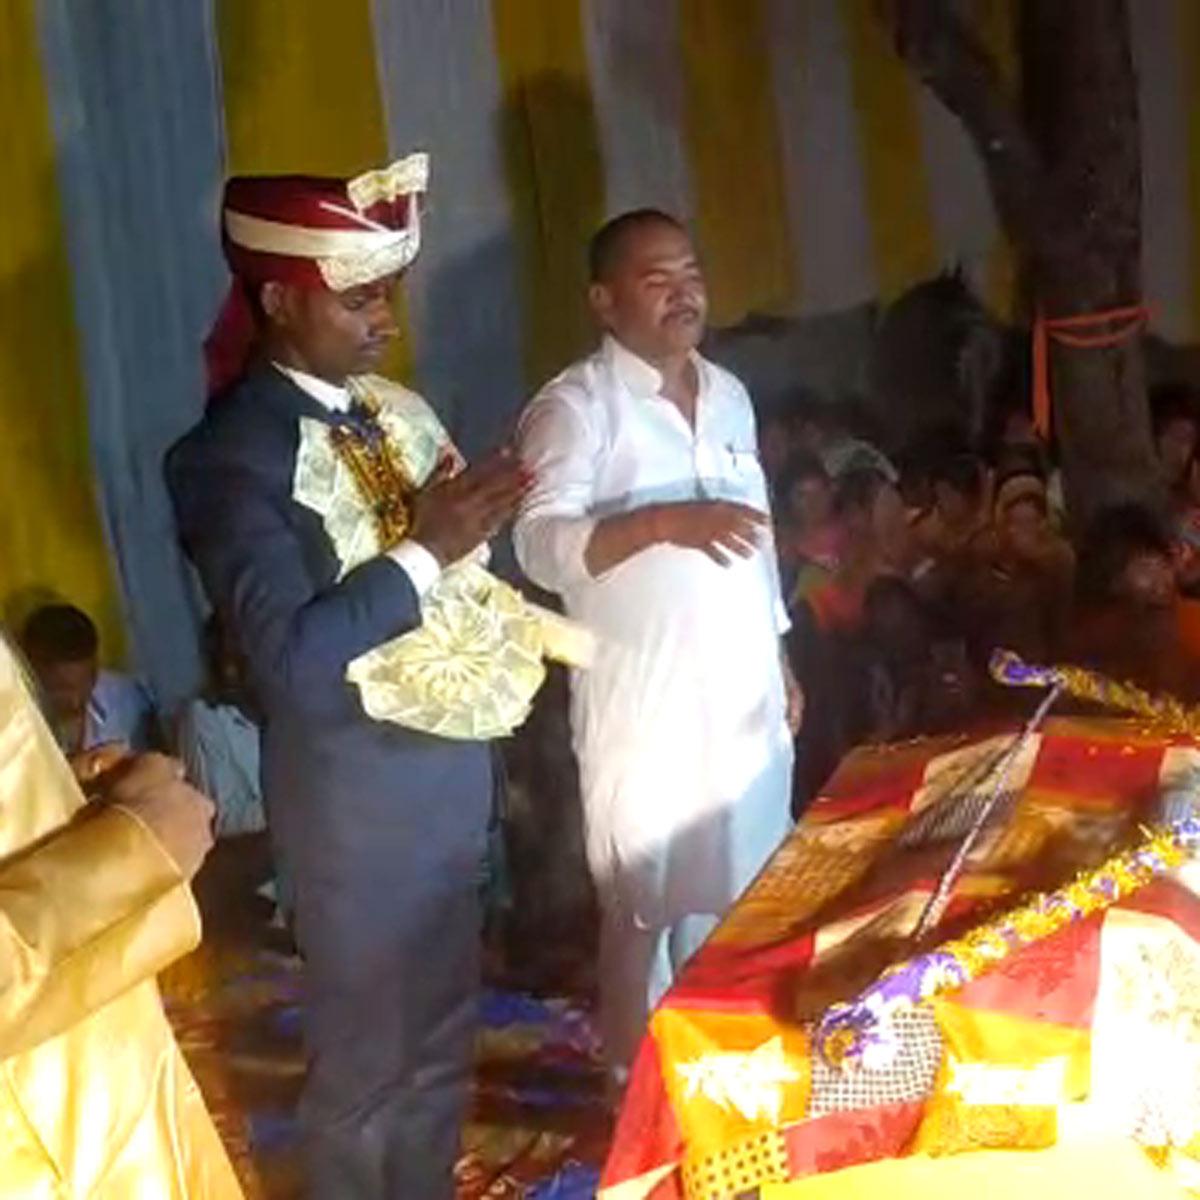 groom broke Shiva bow